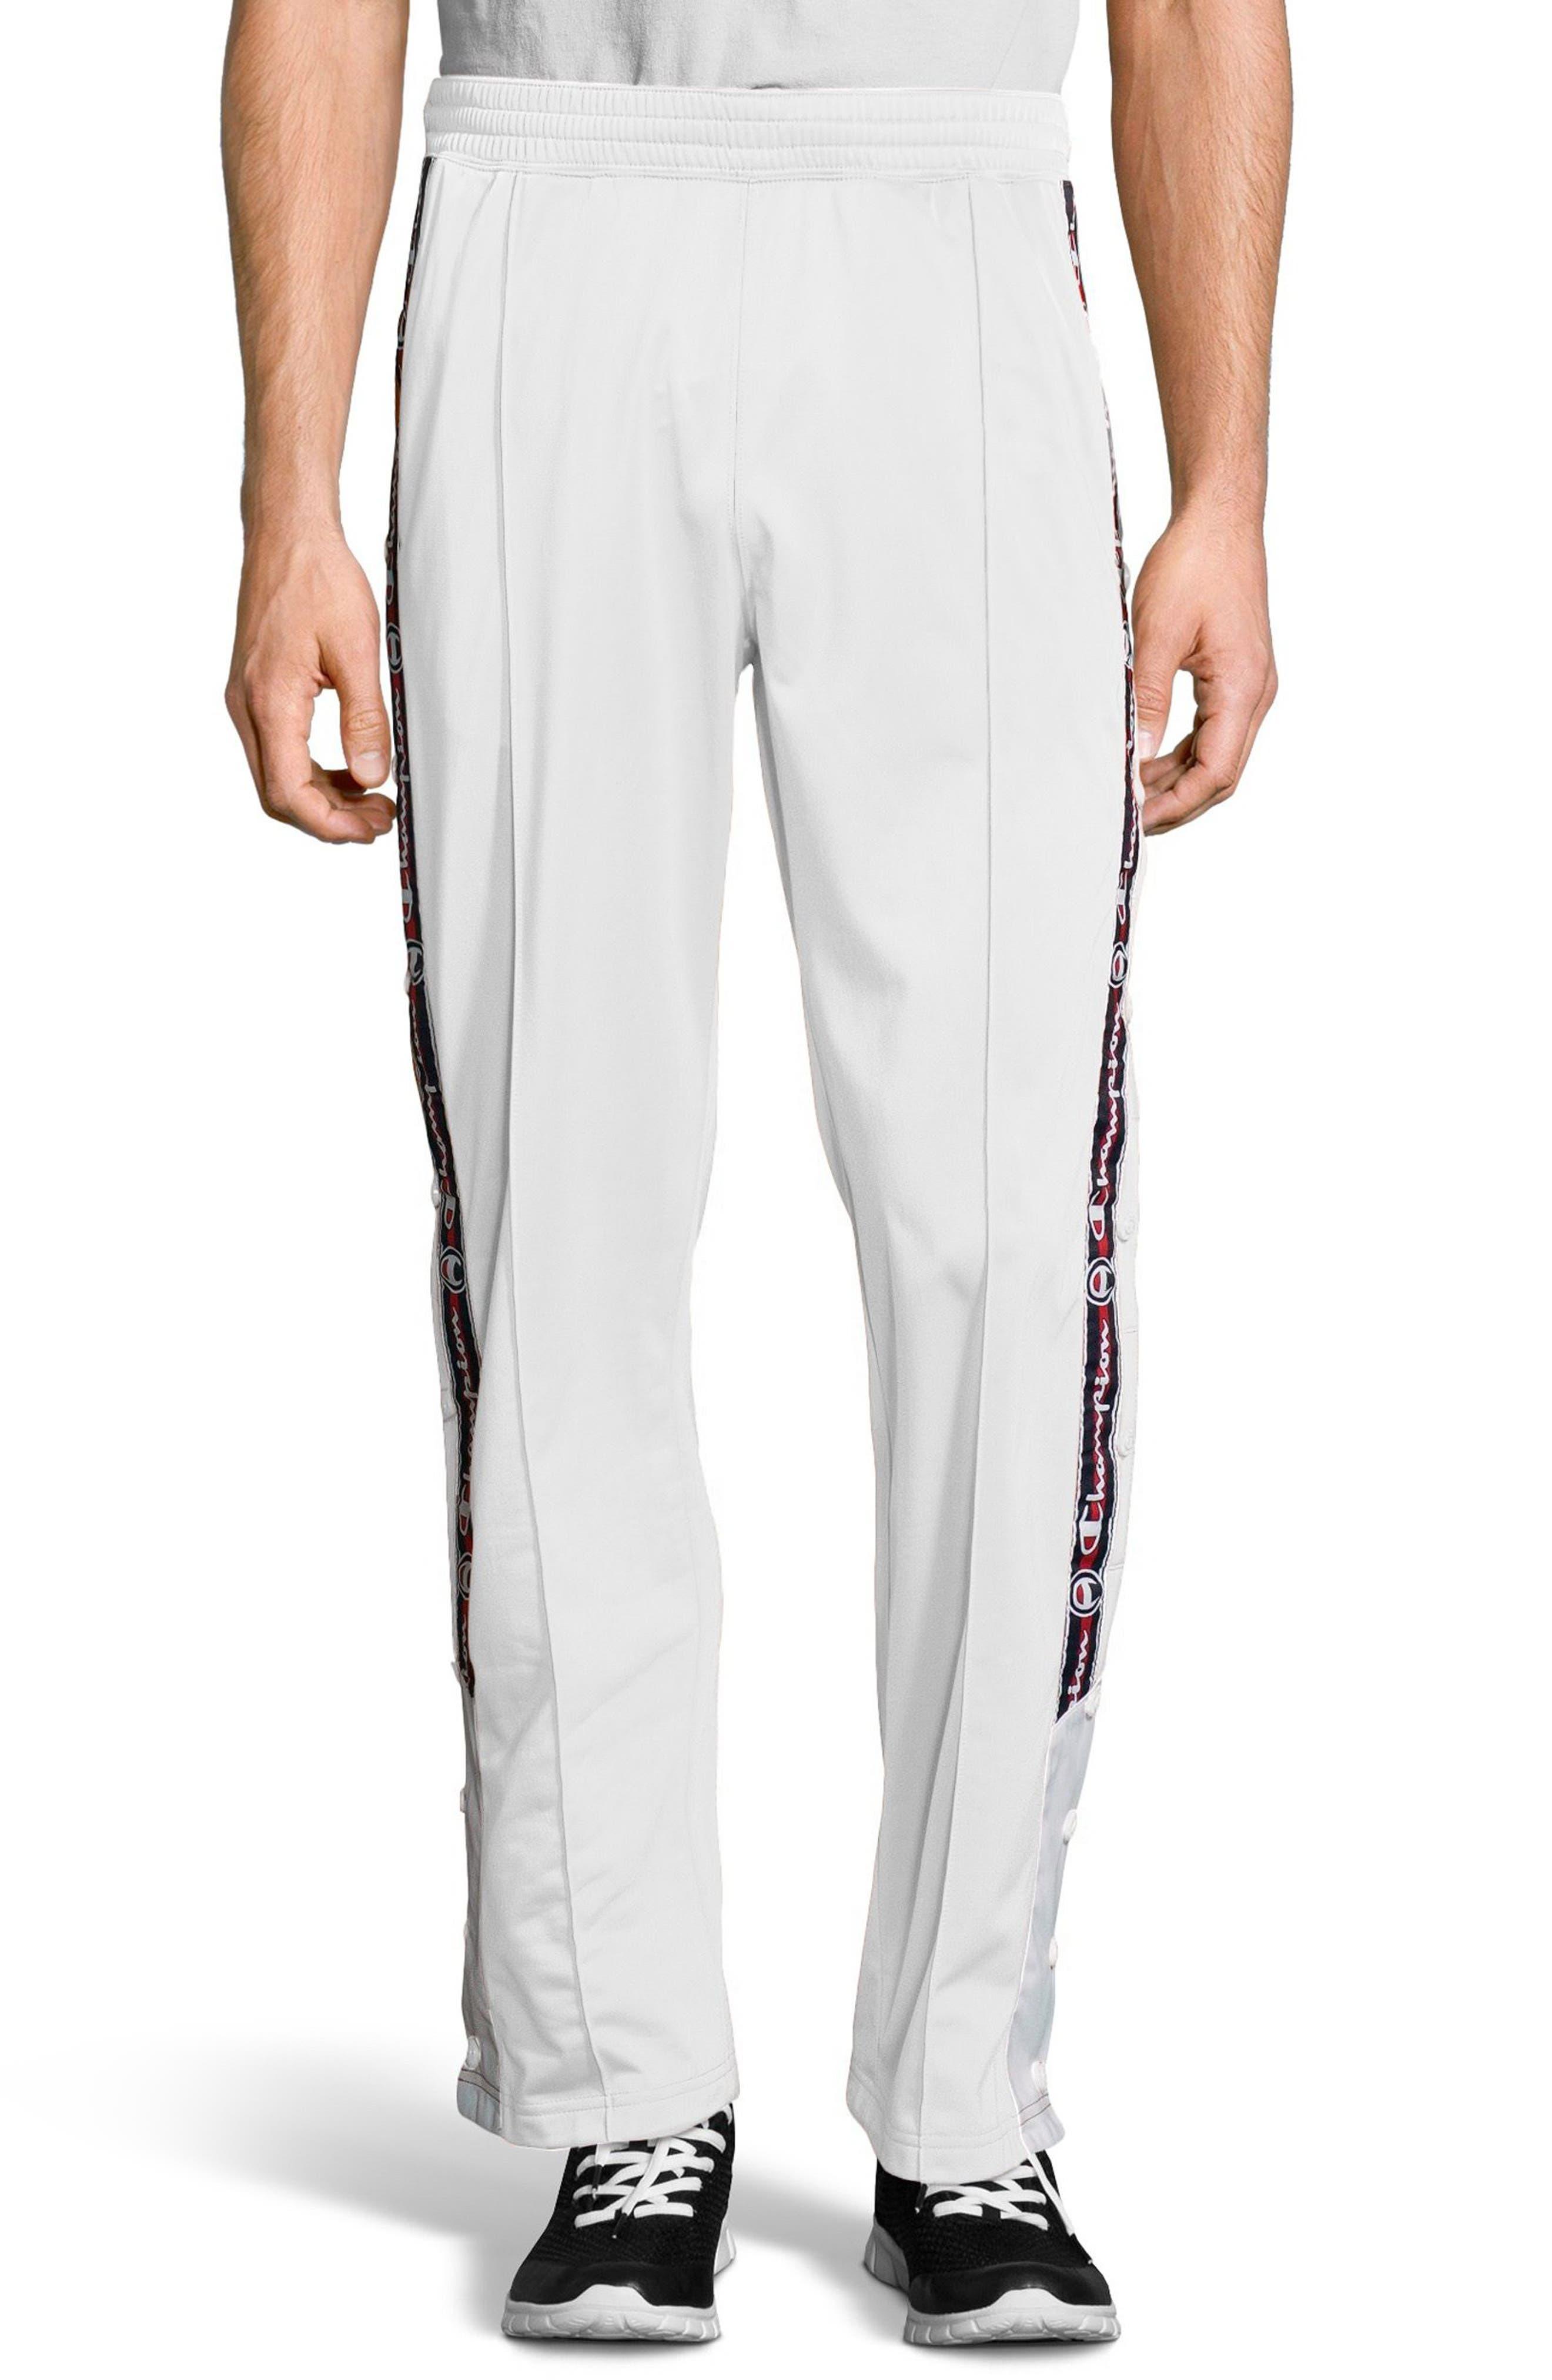 Champion Polywarp Knit Pants